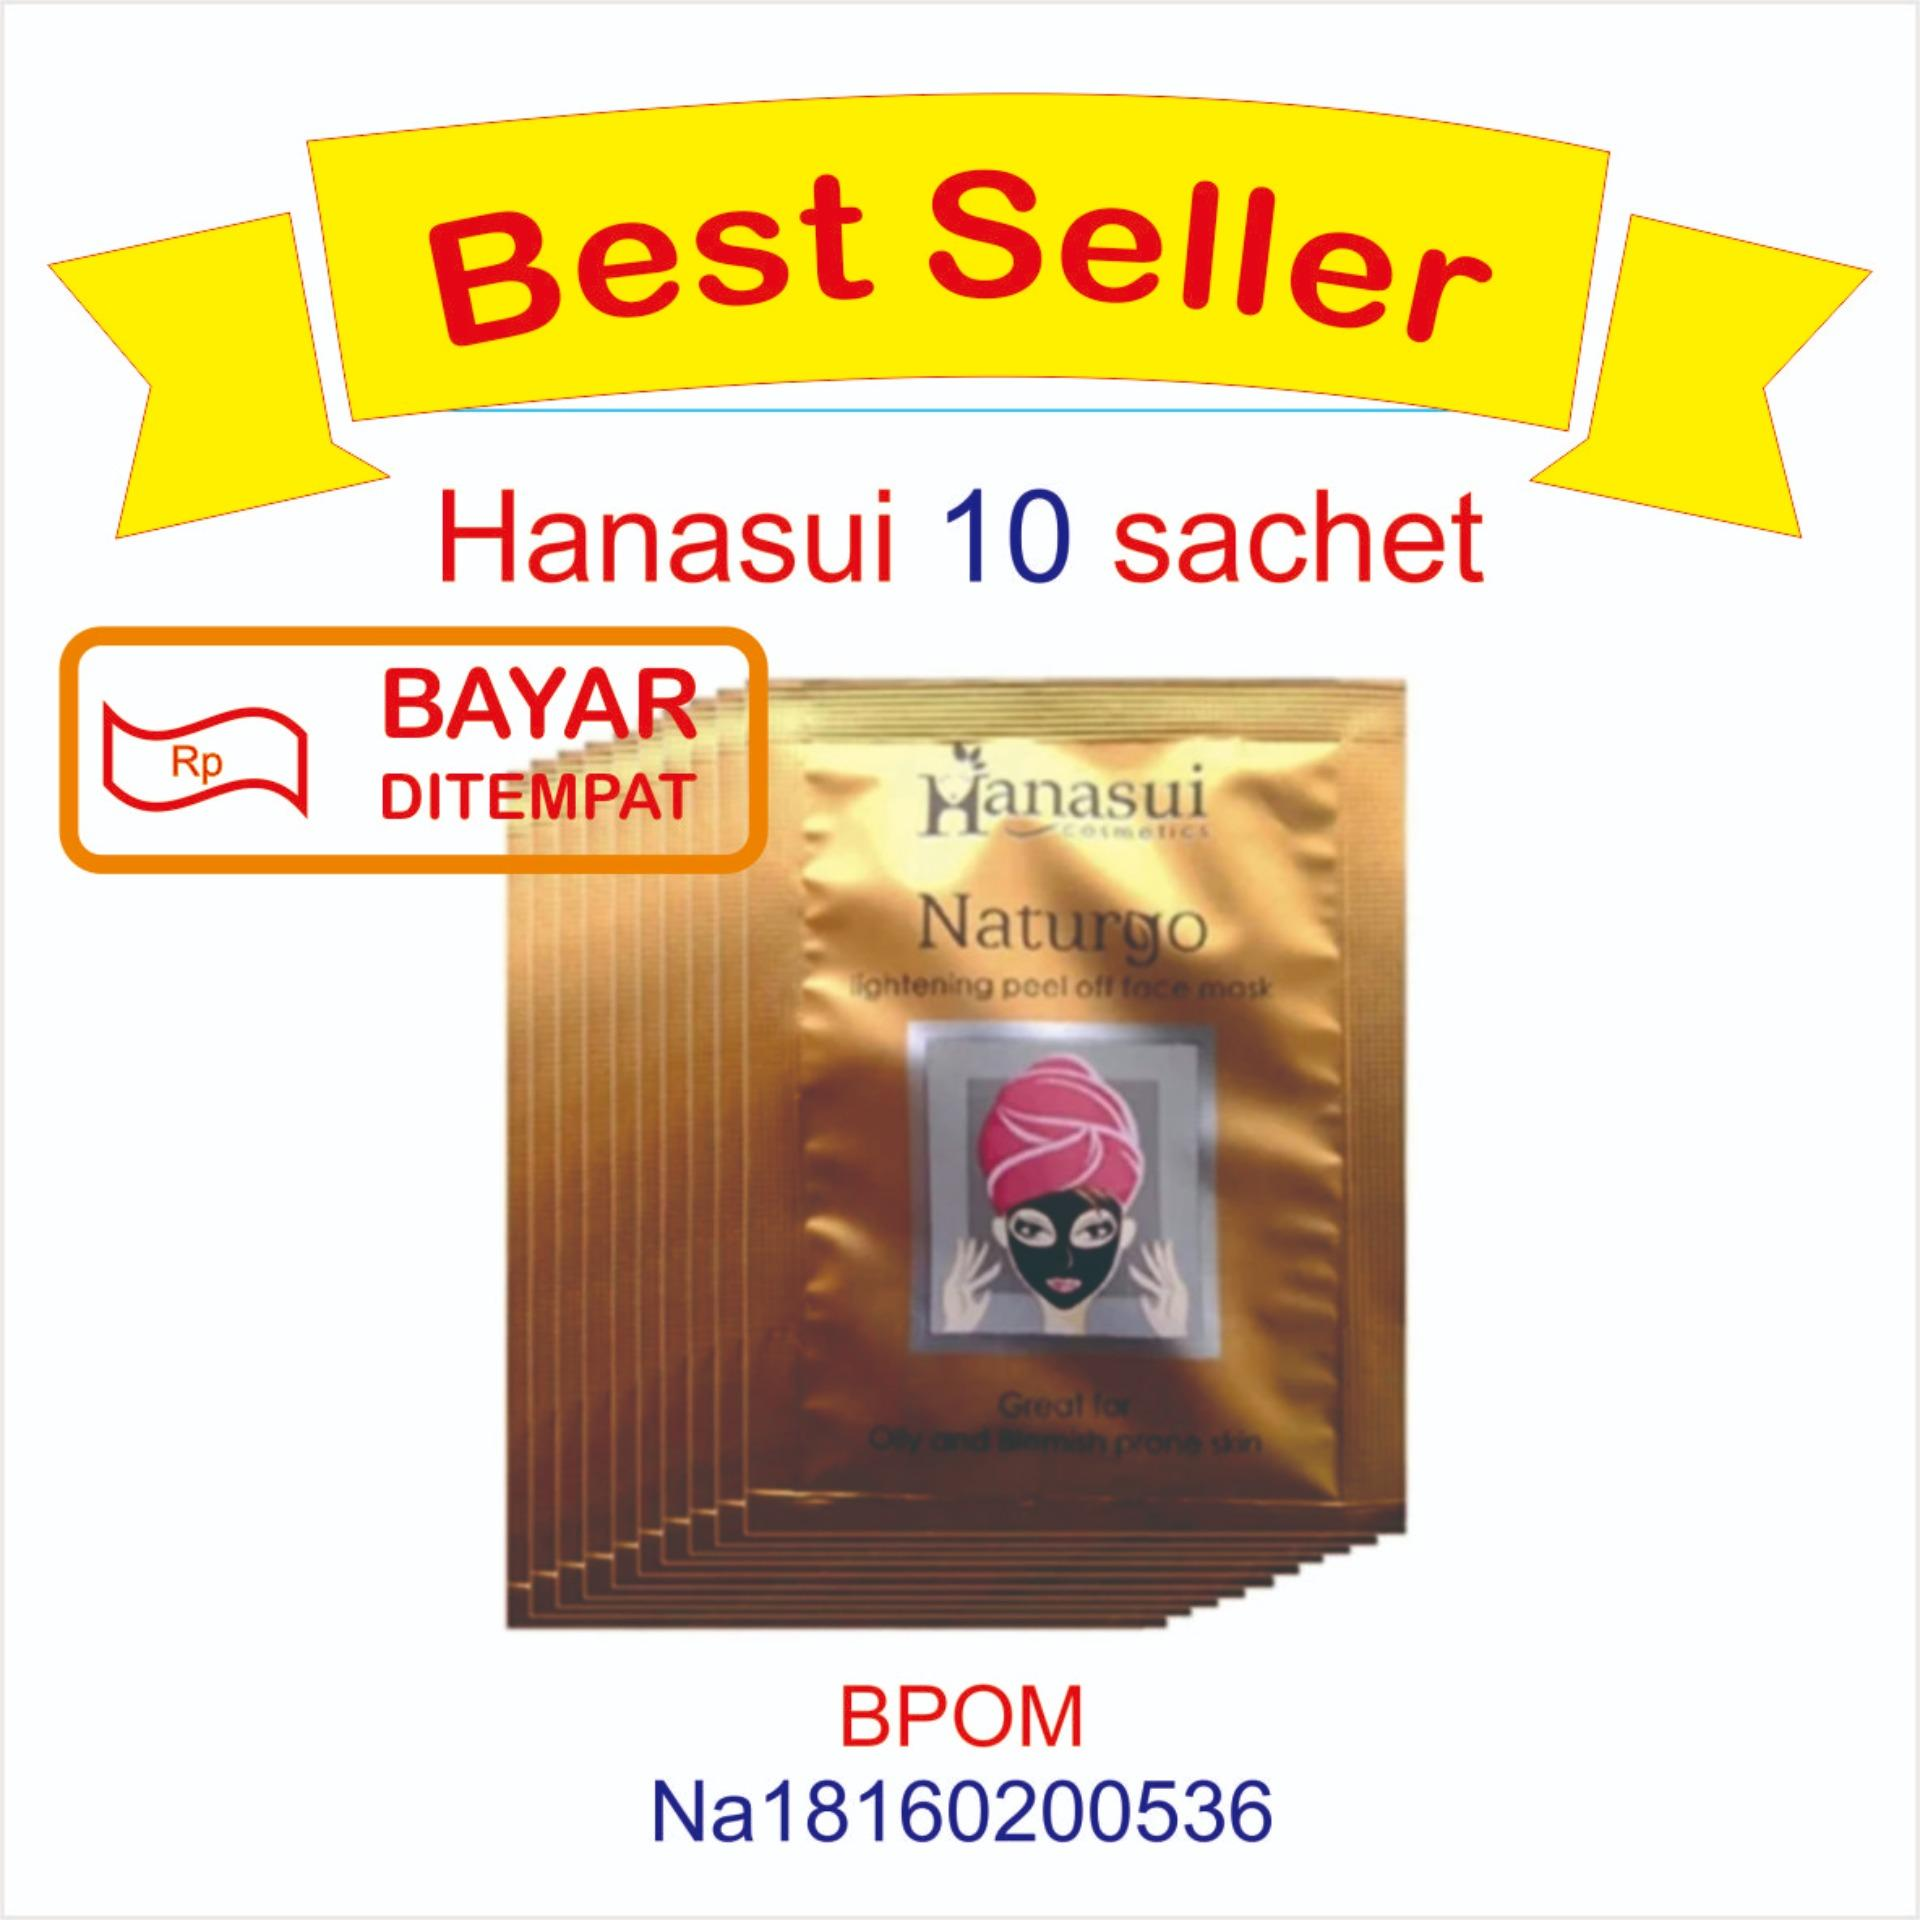 Fitur Hanasui Naturgo Masker Lumpur Pengangkat Komedo Original Bpom Paket 5 Pcs 10 Sachet